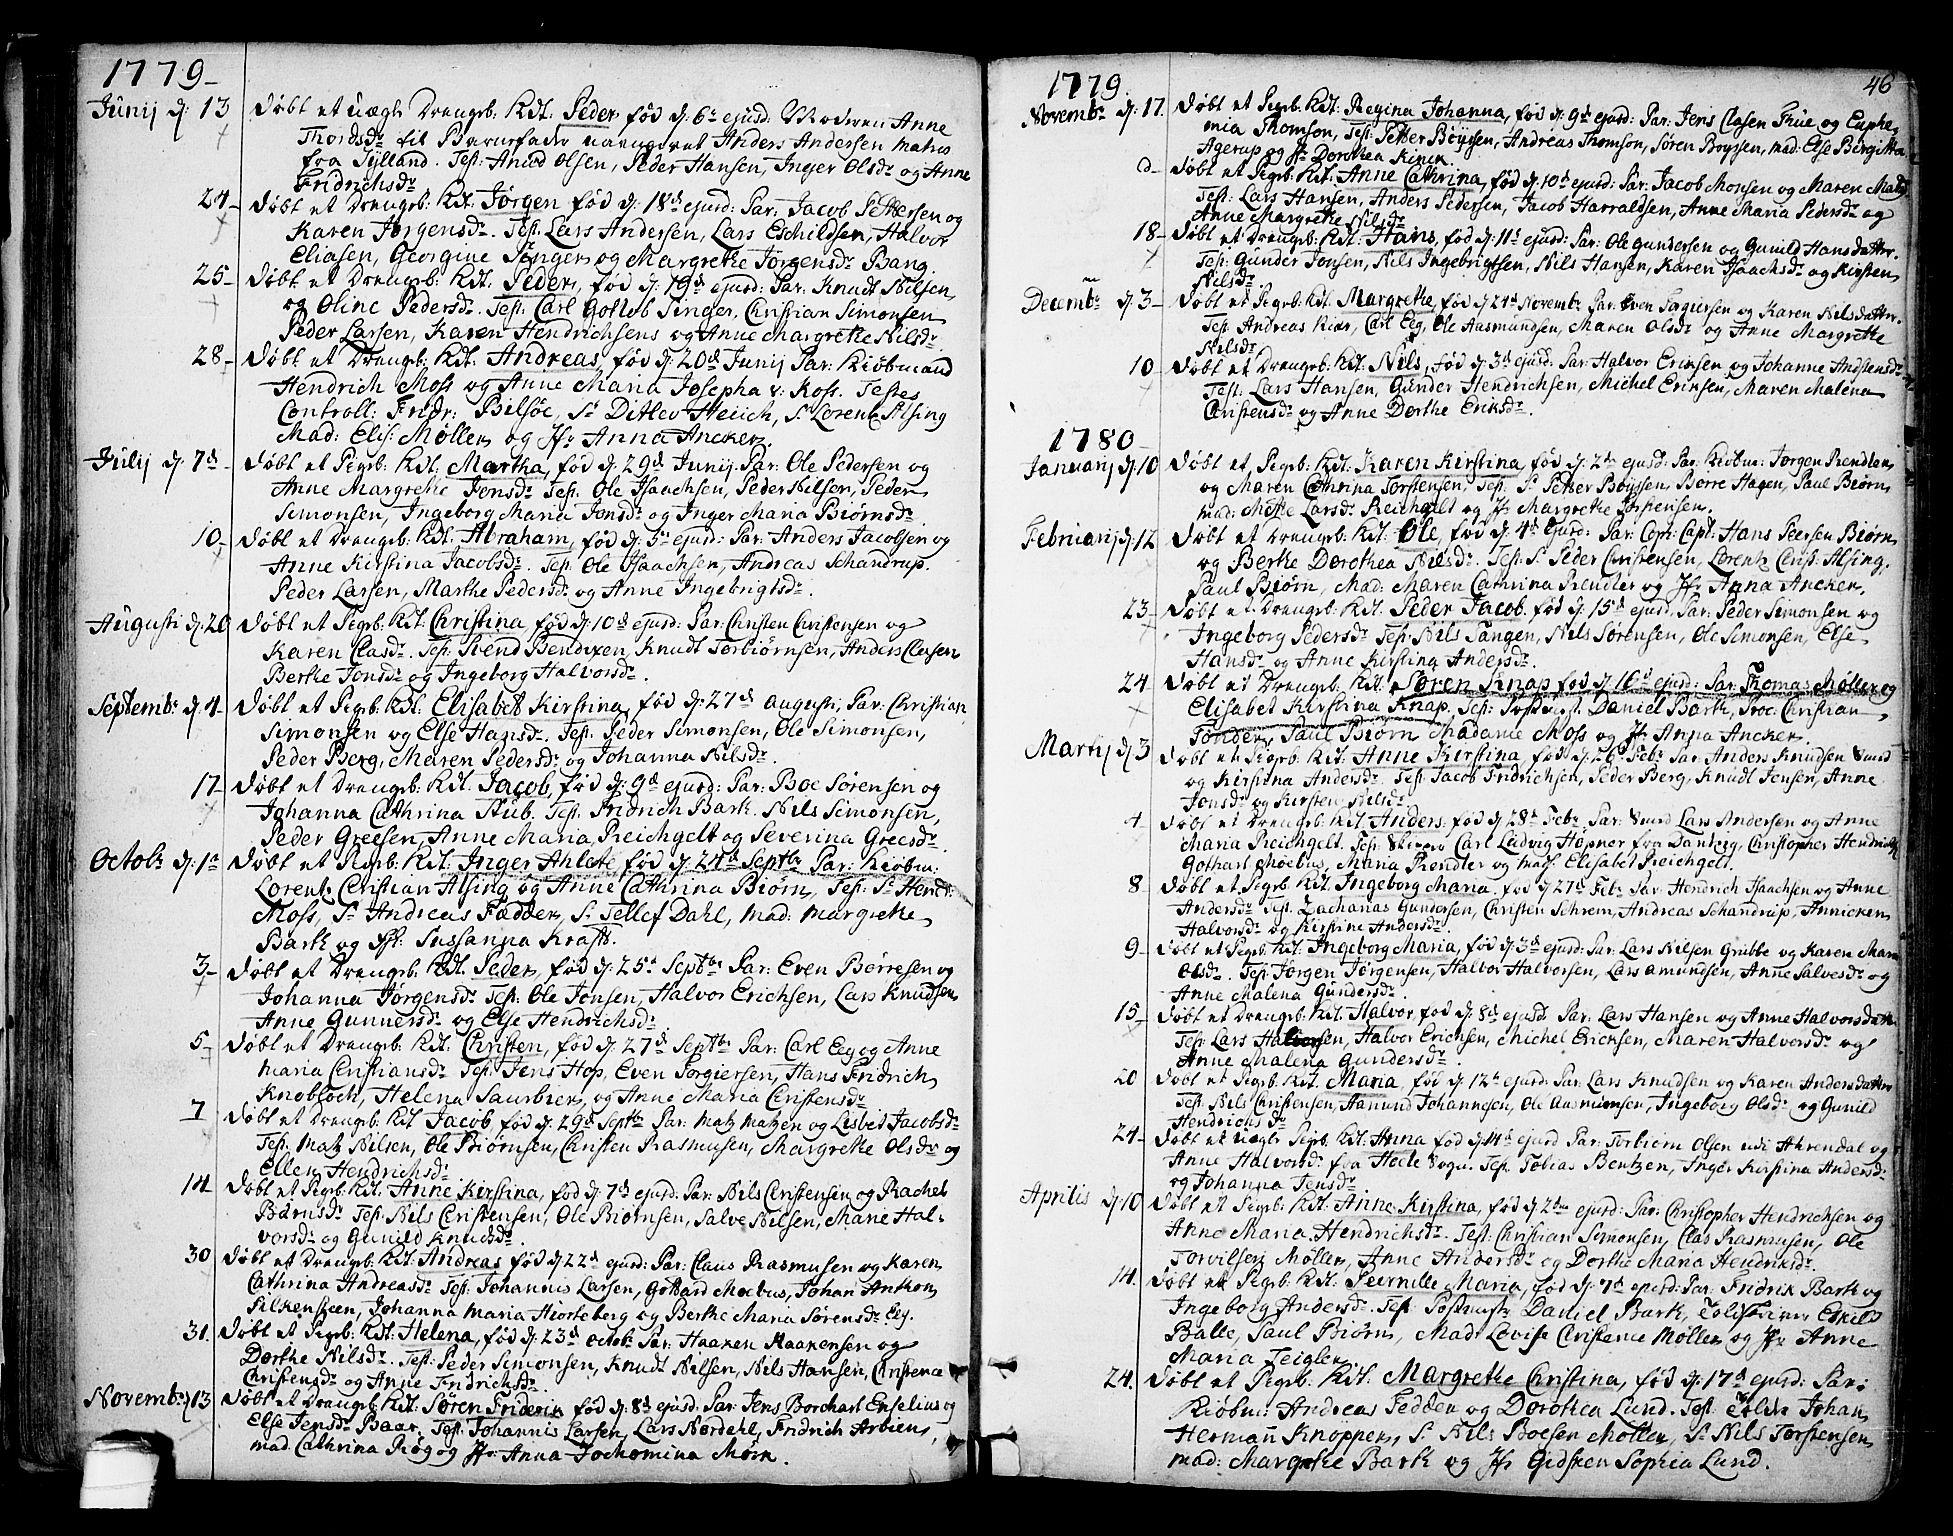 SAKO, Kragerø kirkebøker, F/Fa/L0002: Ministerialbok nr. 2, 1767-1802, s. 46